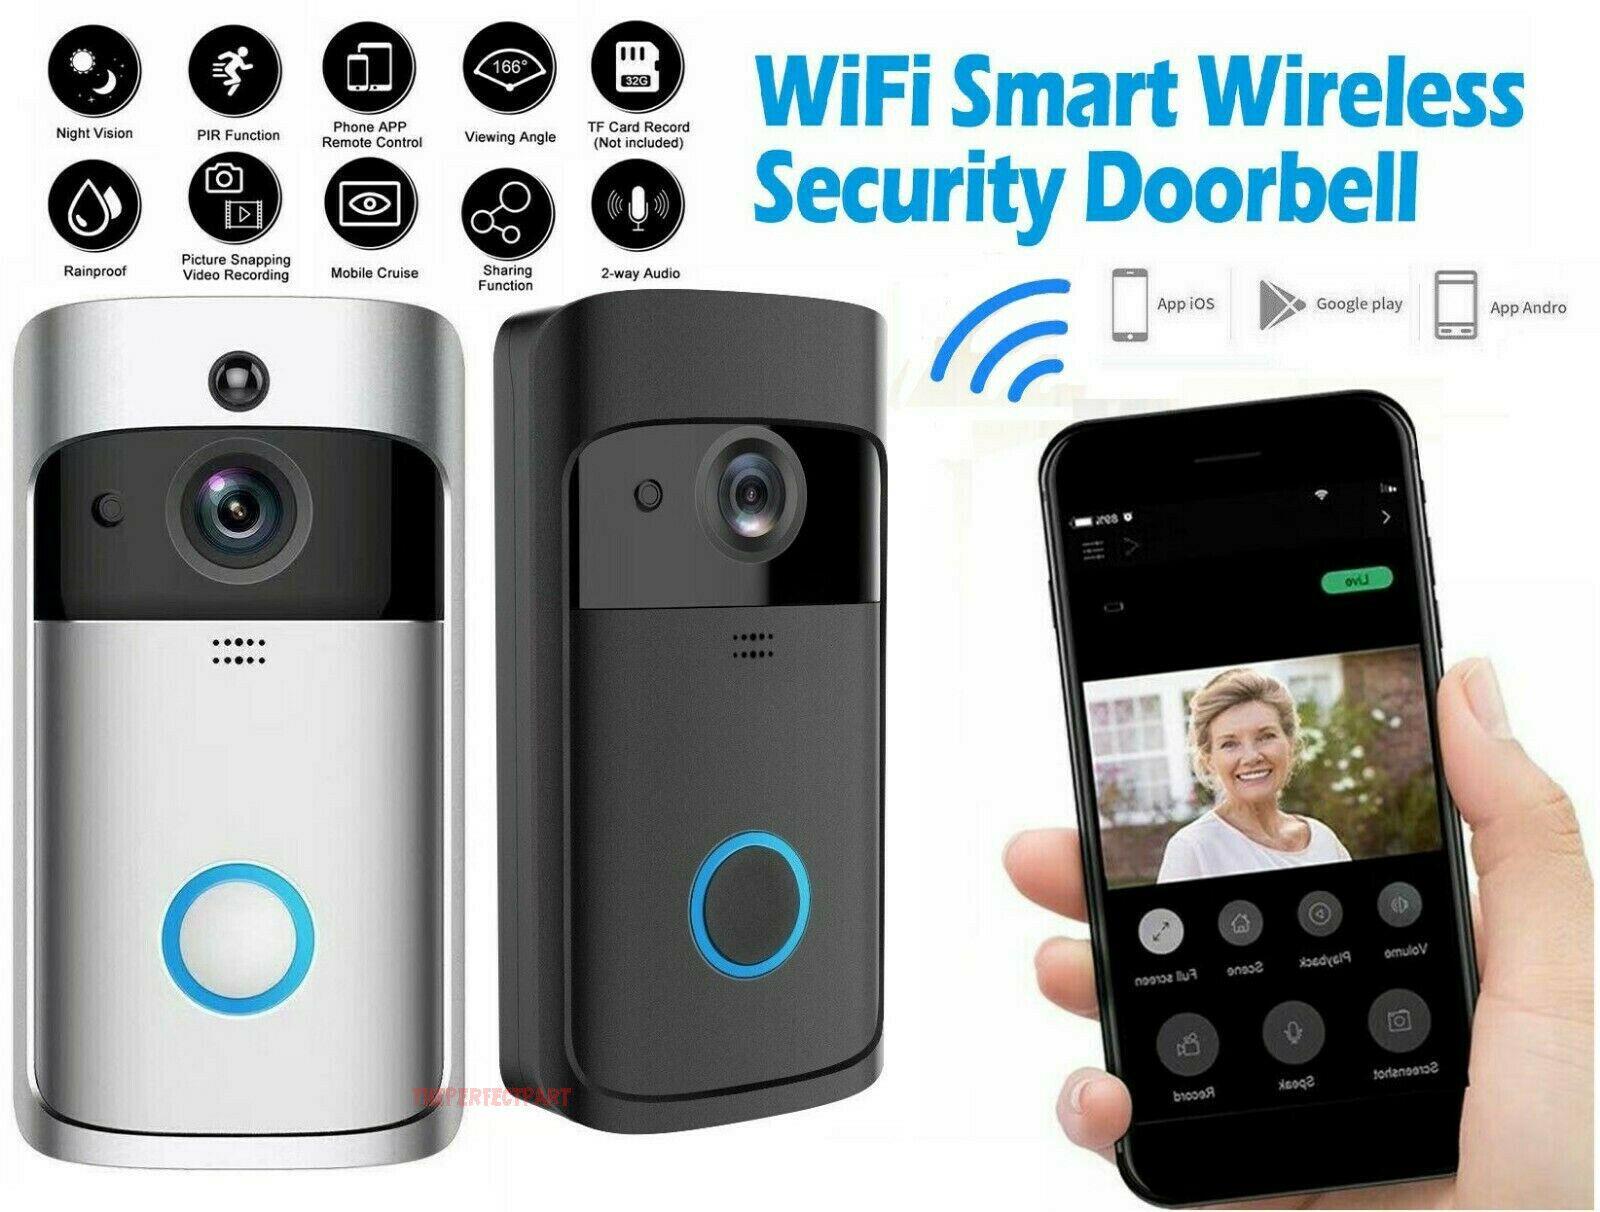 Neues WLAN-WLAN-Video-Türklingel-Smartphone-Türring-Intercom-Sicherheits-Kamera Bell Mobile Remote-Videoüberwachungs-Alarm-Video-Türklingel